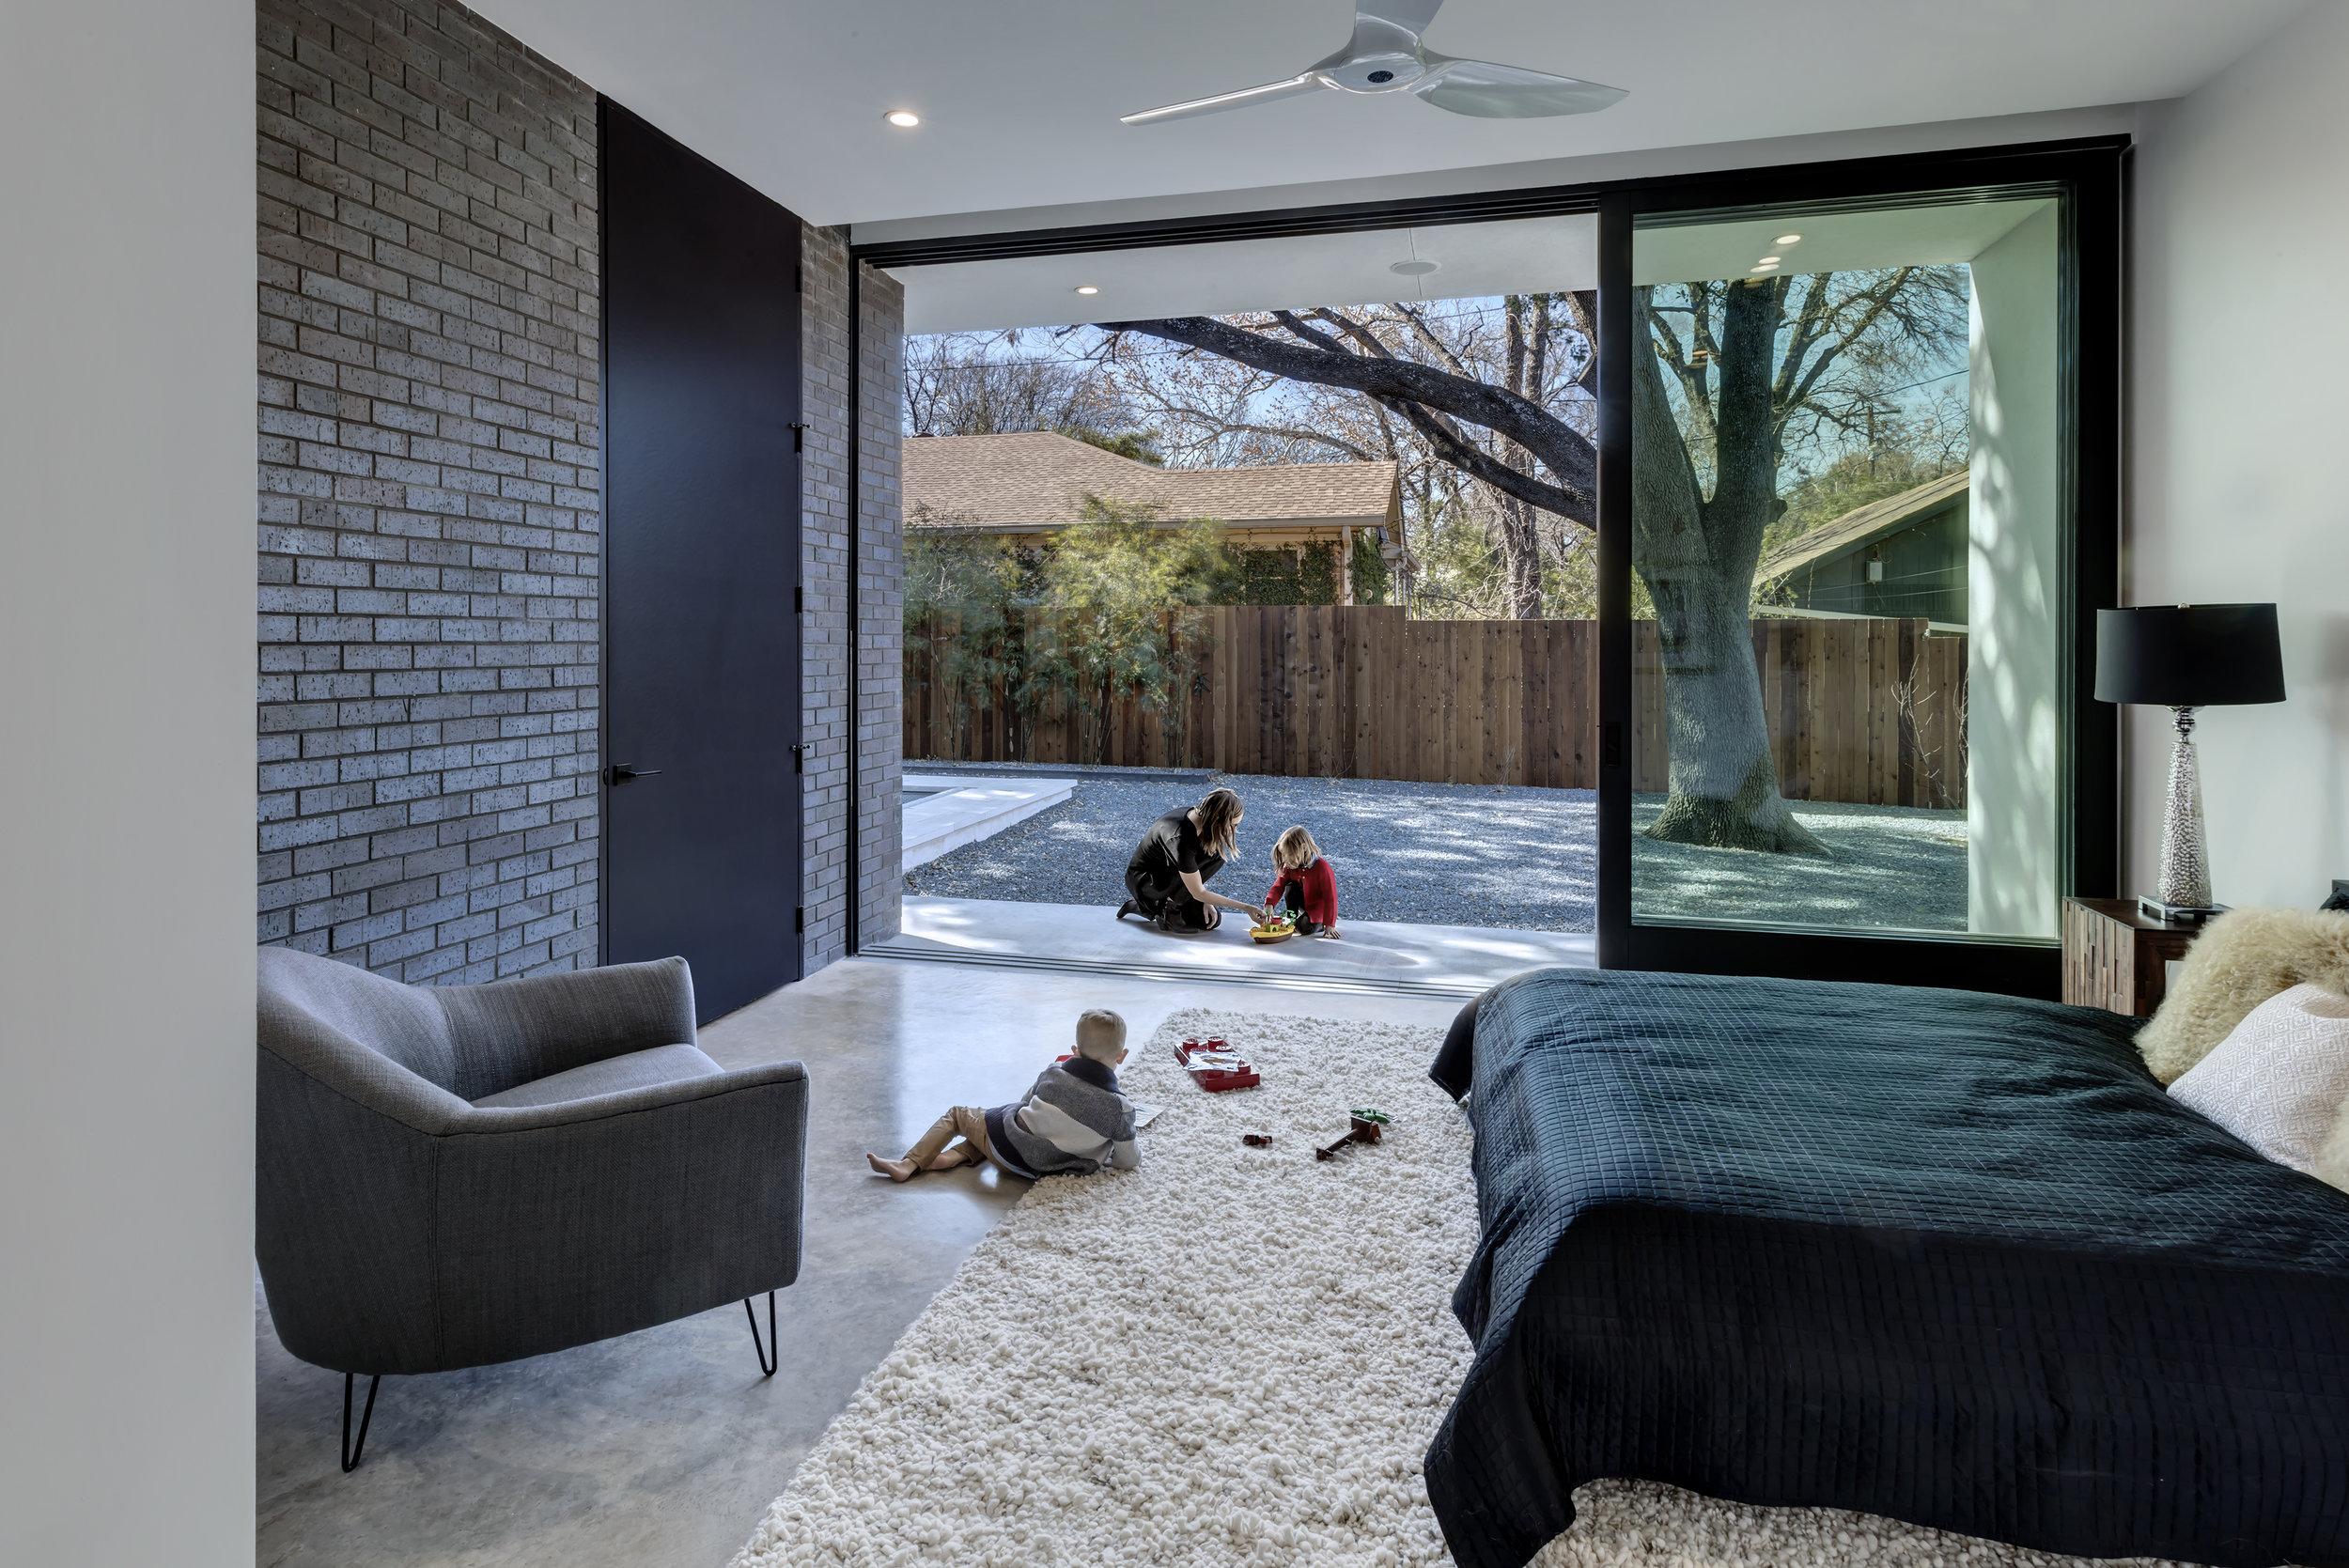 02 Master Bedroom_Main Stay House by Matt Fajkus Architecture_Photo 1 by Charles Davis Smith.jpg